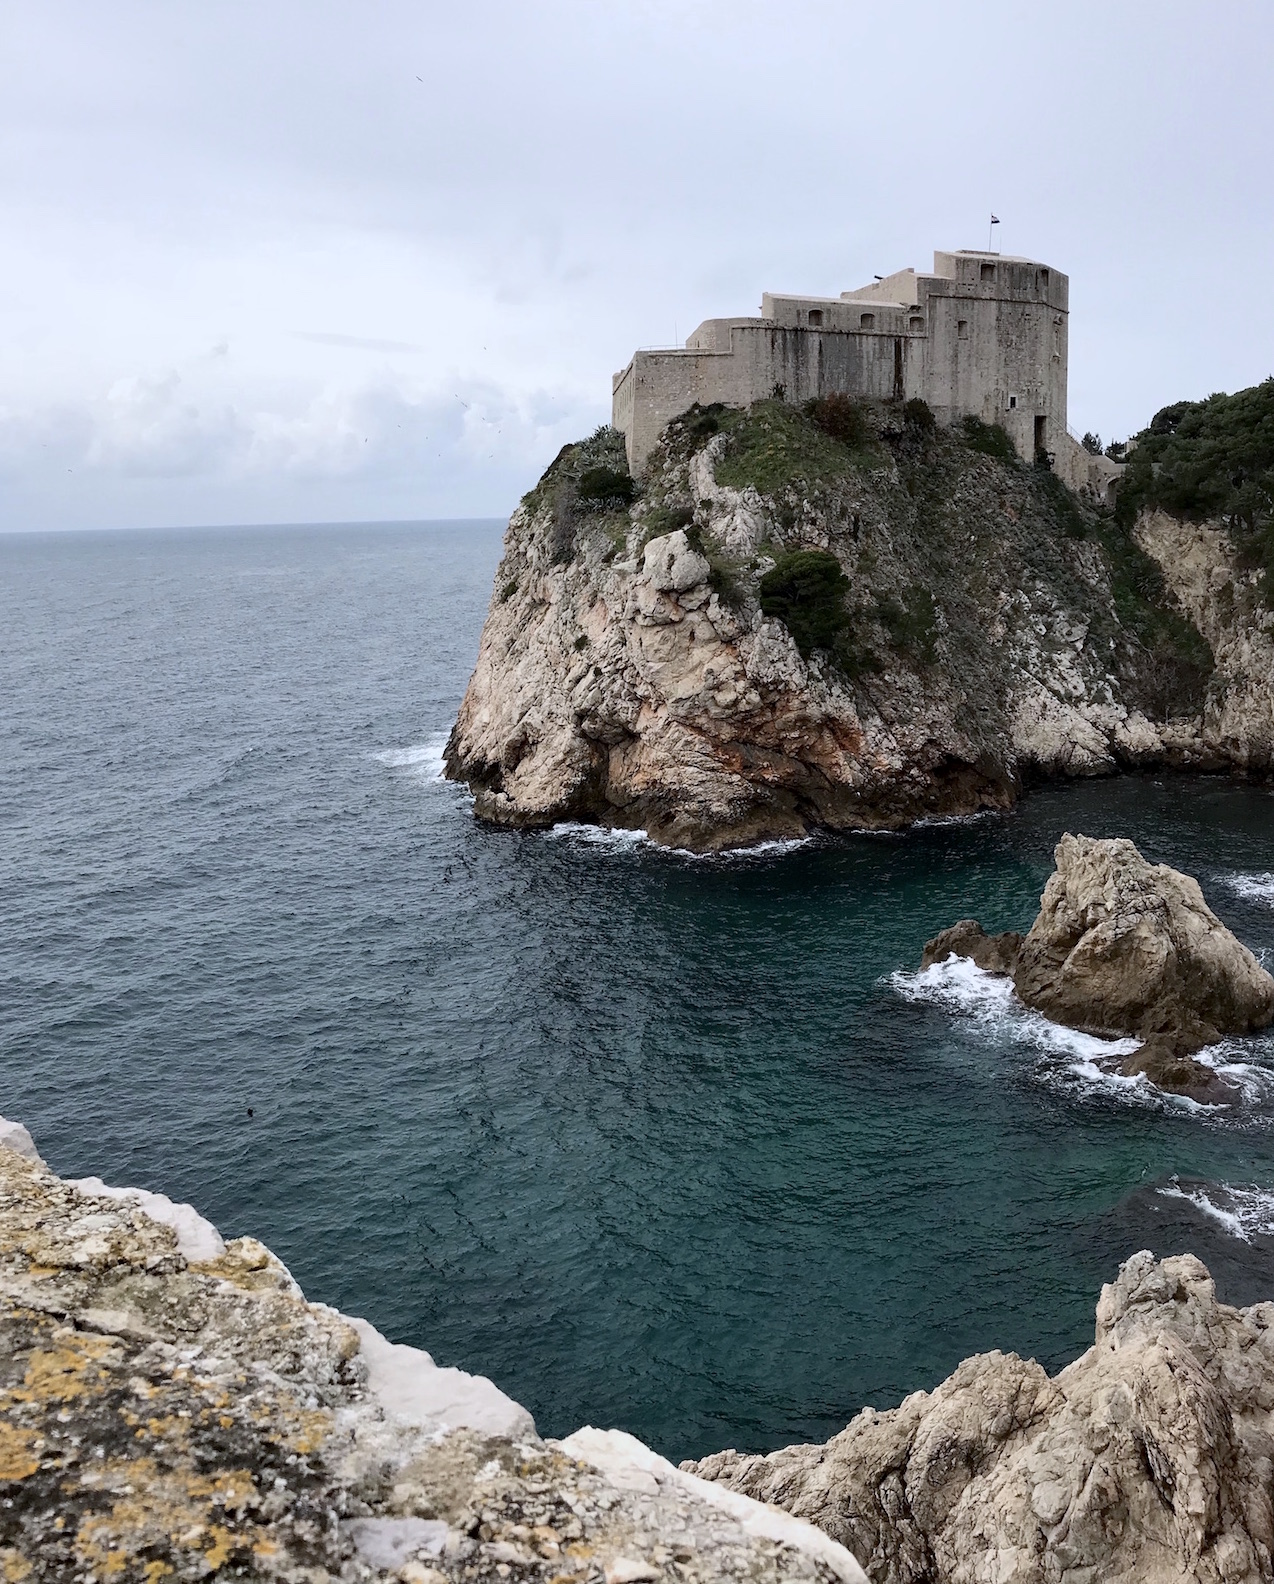 fort lovrijenac in dubrovnik, croatia